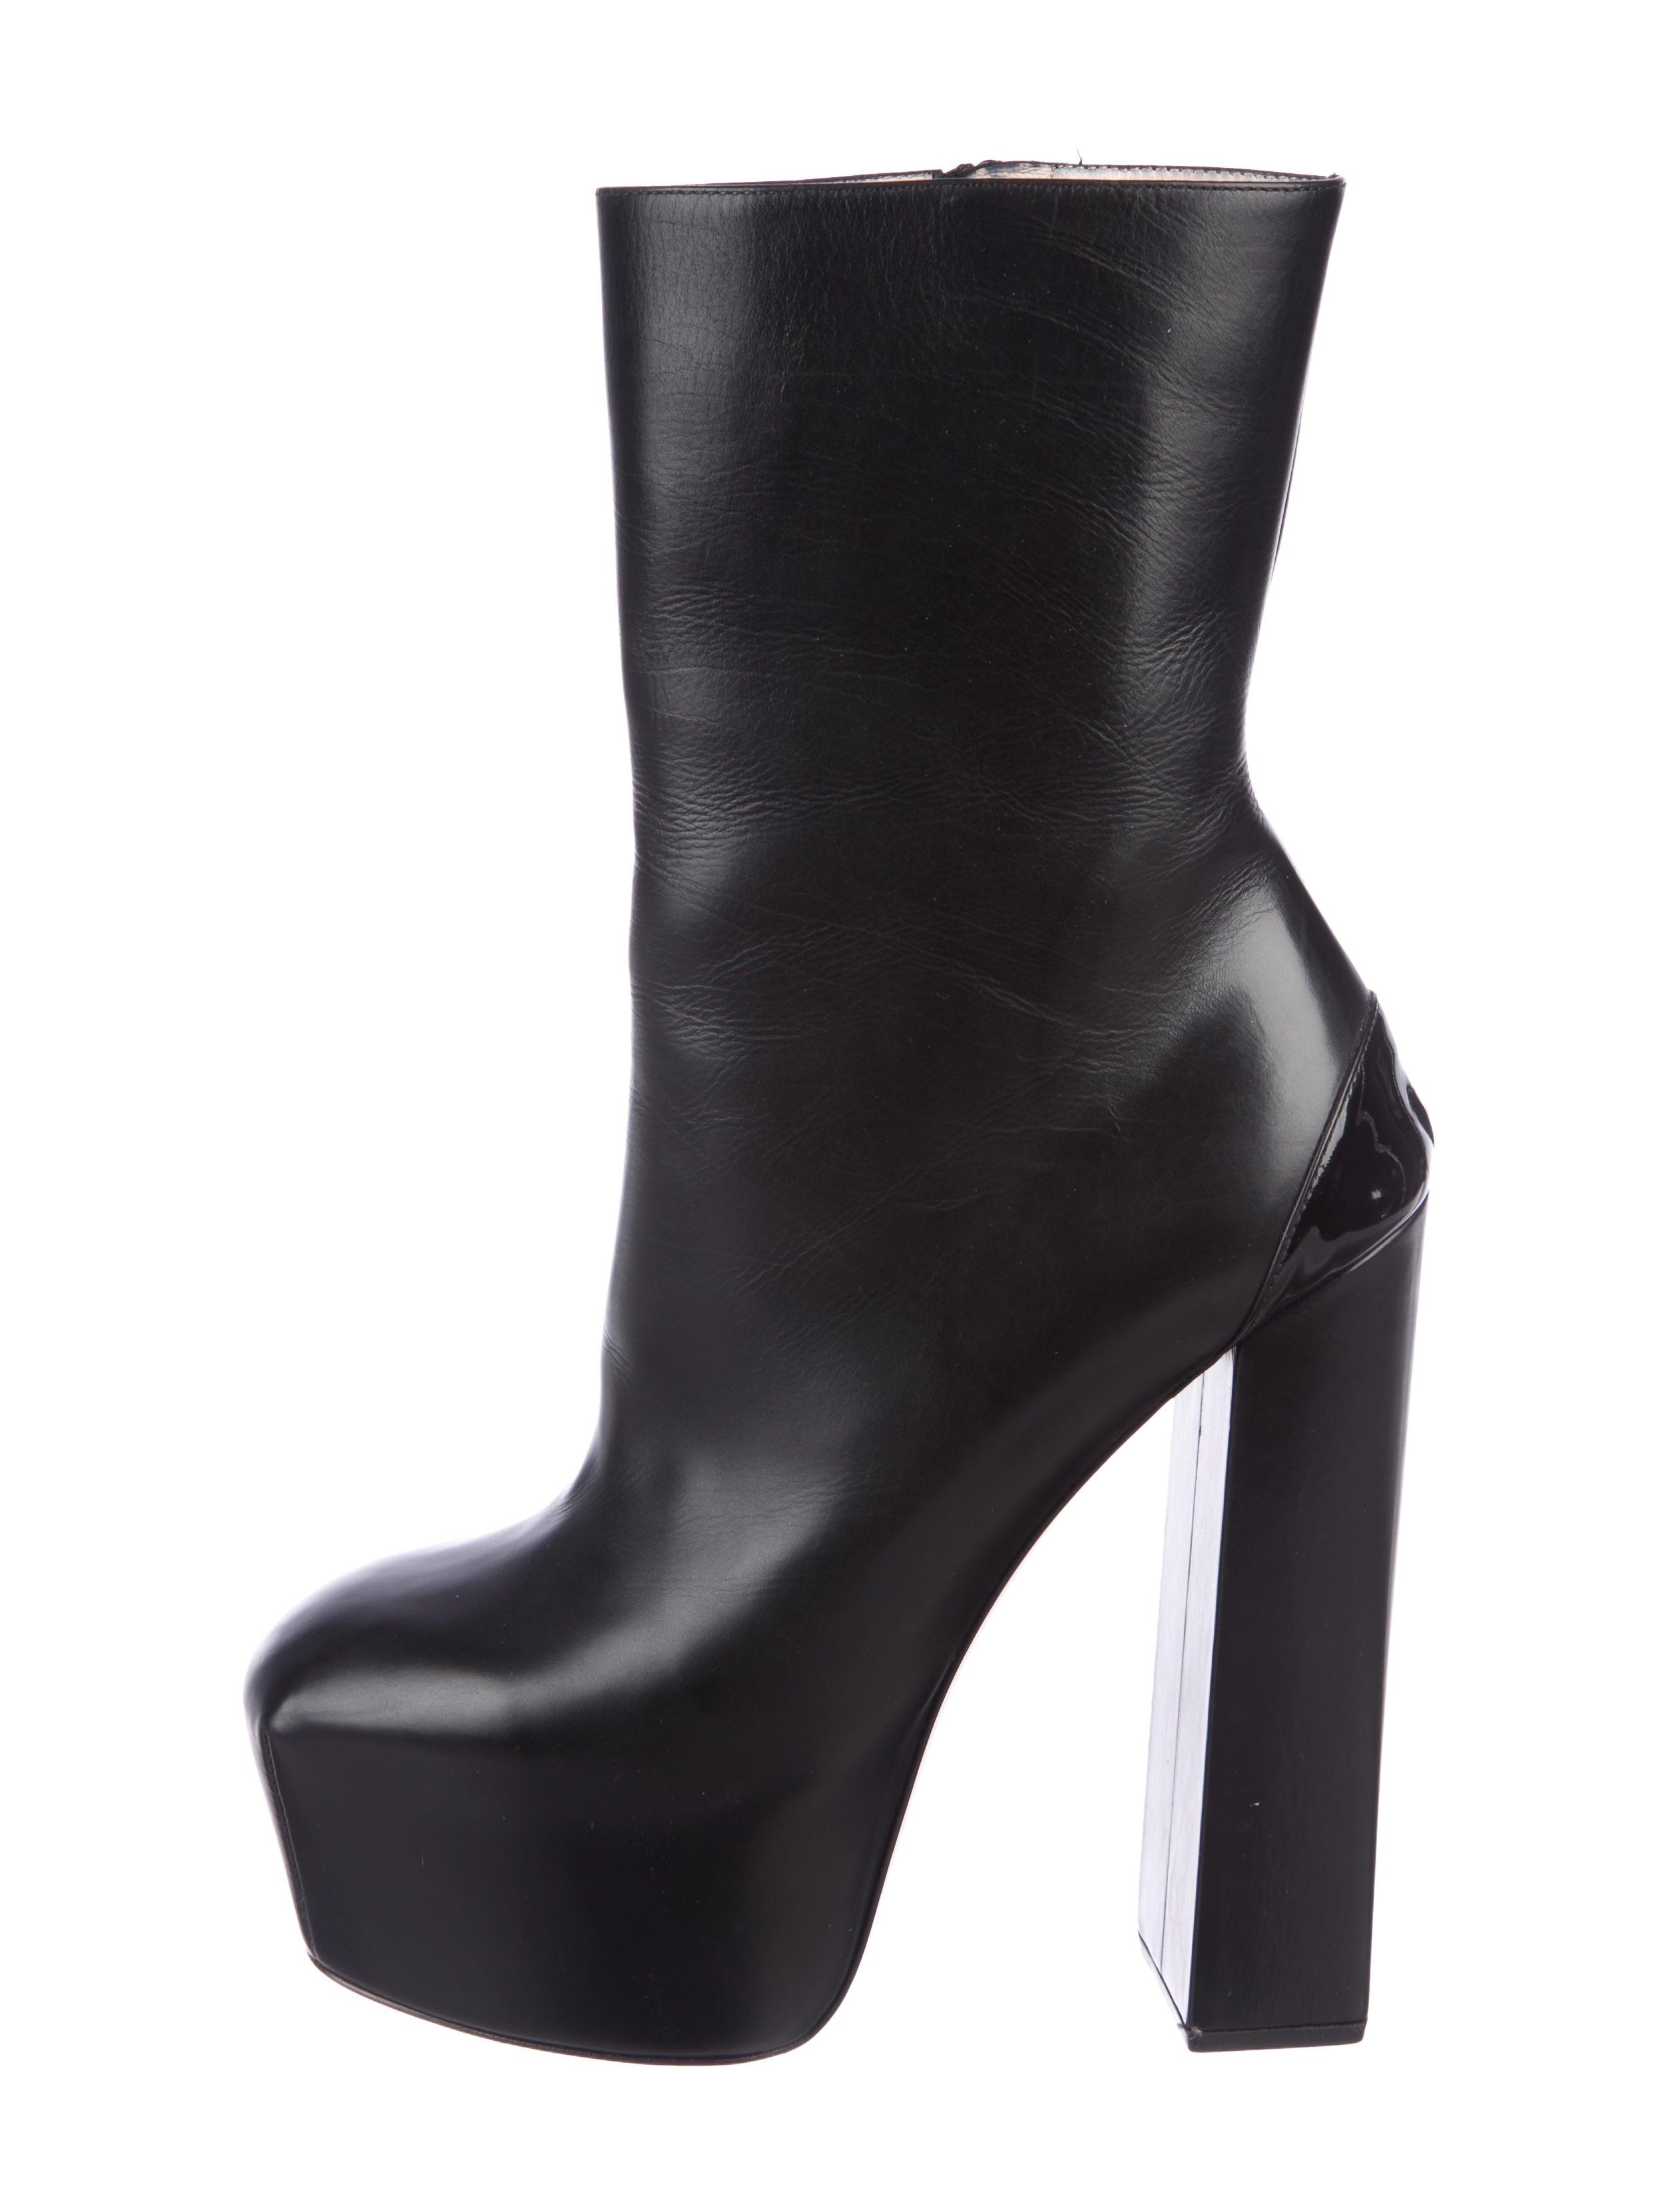 Ruthie Davis Leather Platform Ankle Boots with credit card cheap sale wiki explore cheap sale authentic ZIy1m0